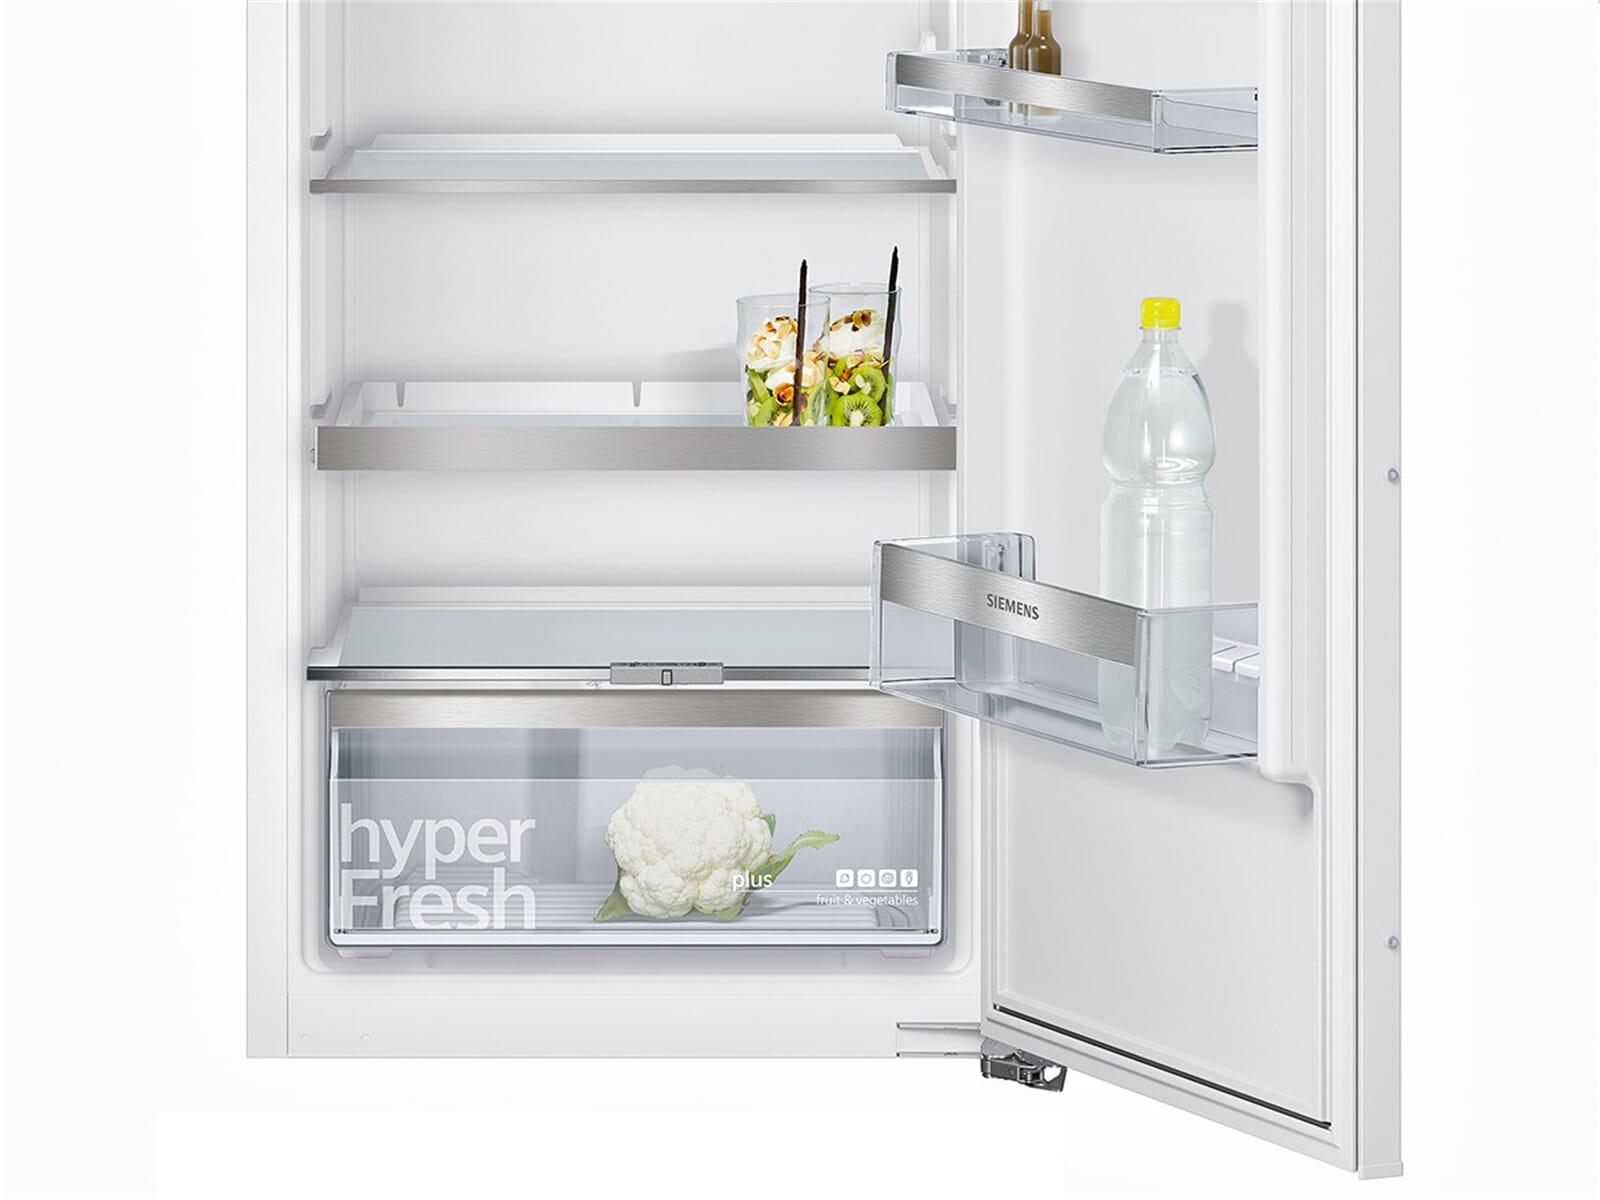 Siemens Kühlschrank Fach : Siemens ki51rad30 einbaukühlschrank